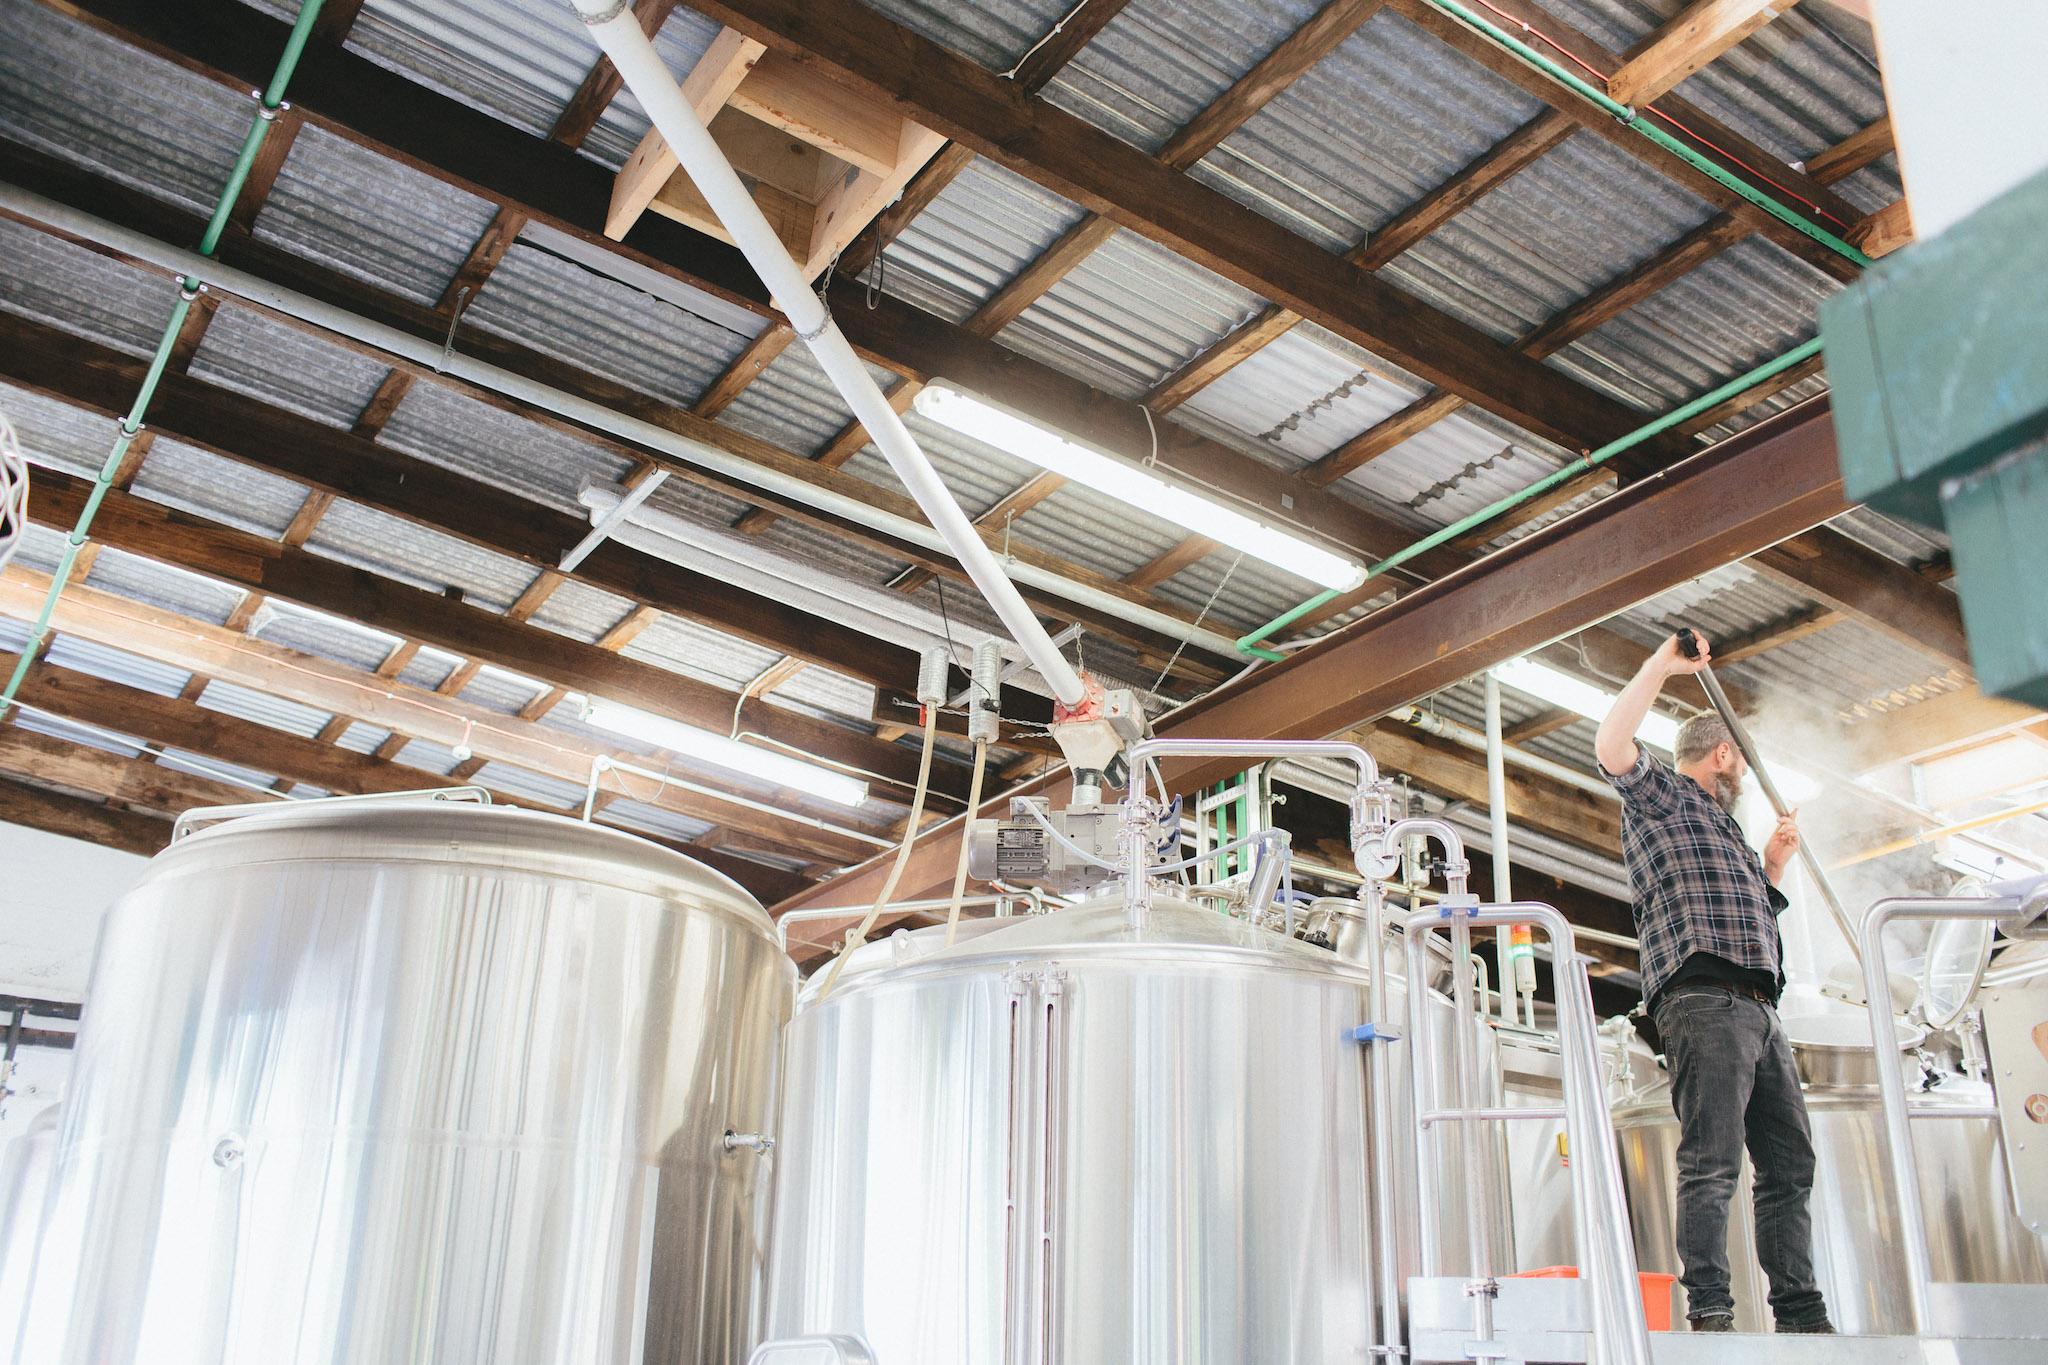 Garage Project 2015 Beer-3.jpeg